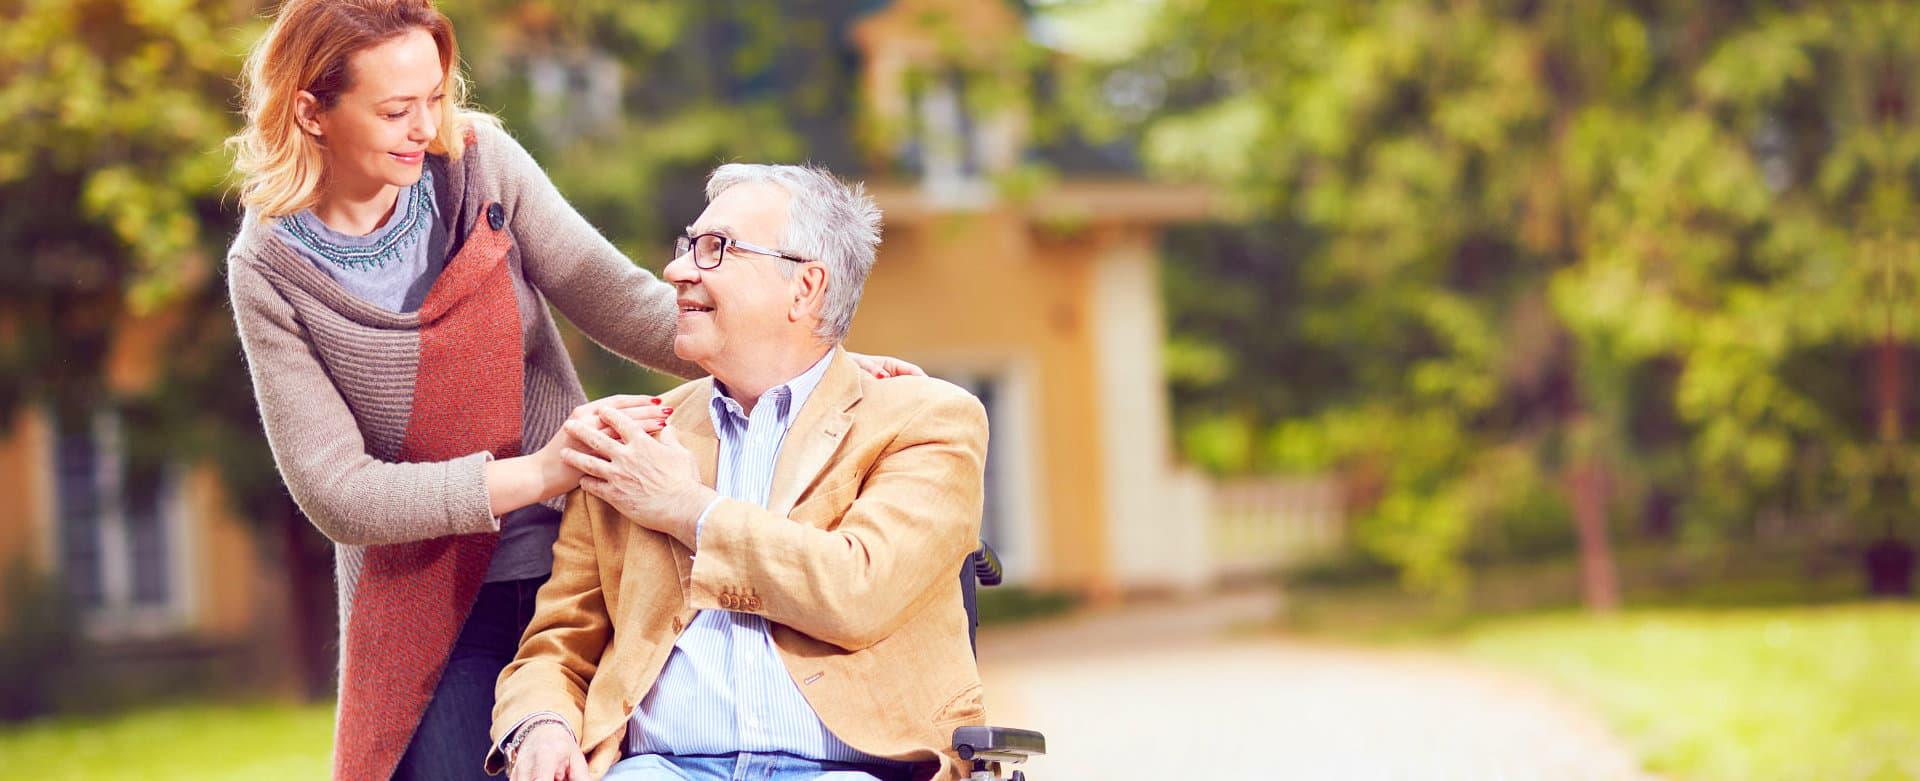 female caregiver and senior man smiling